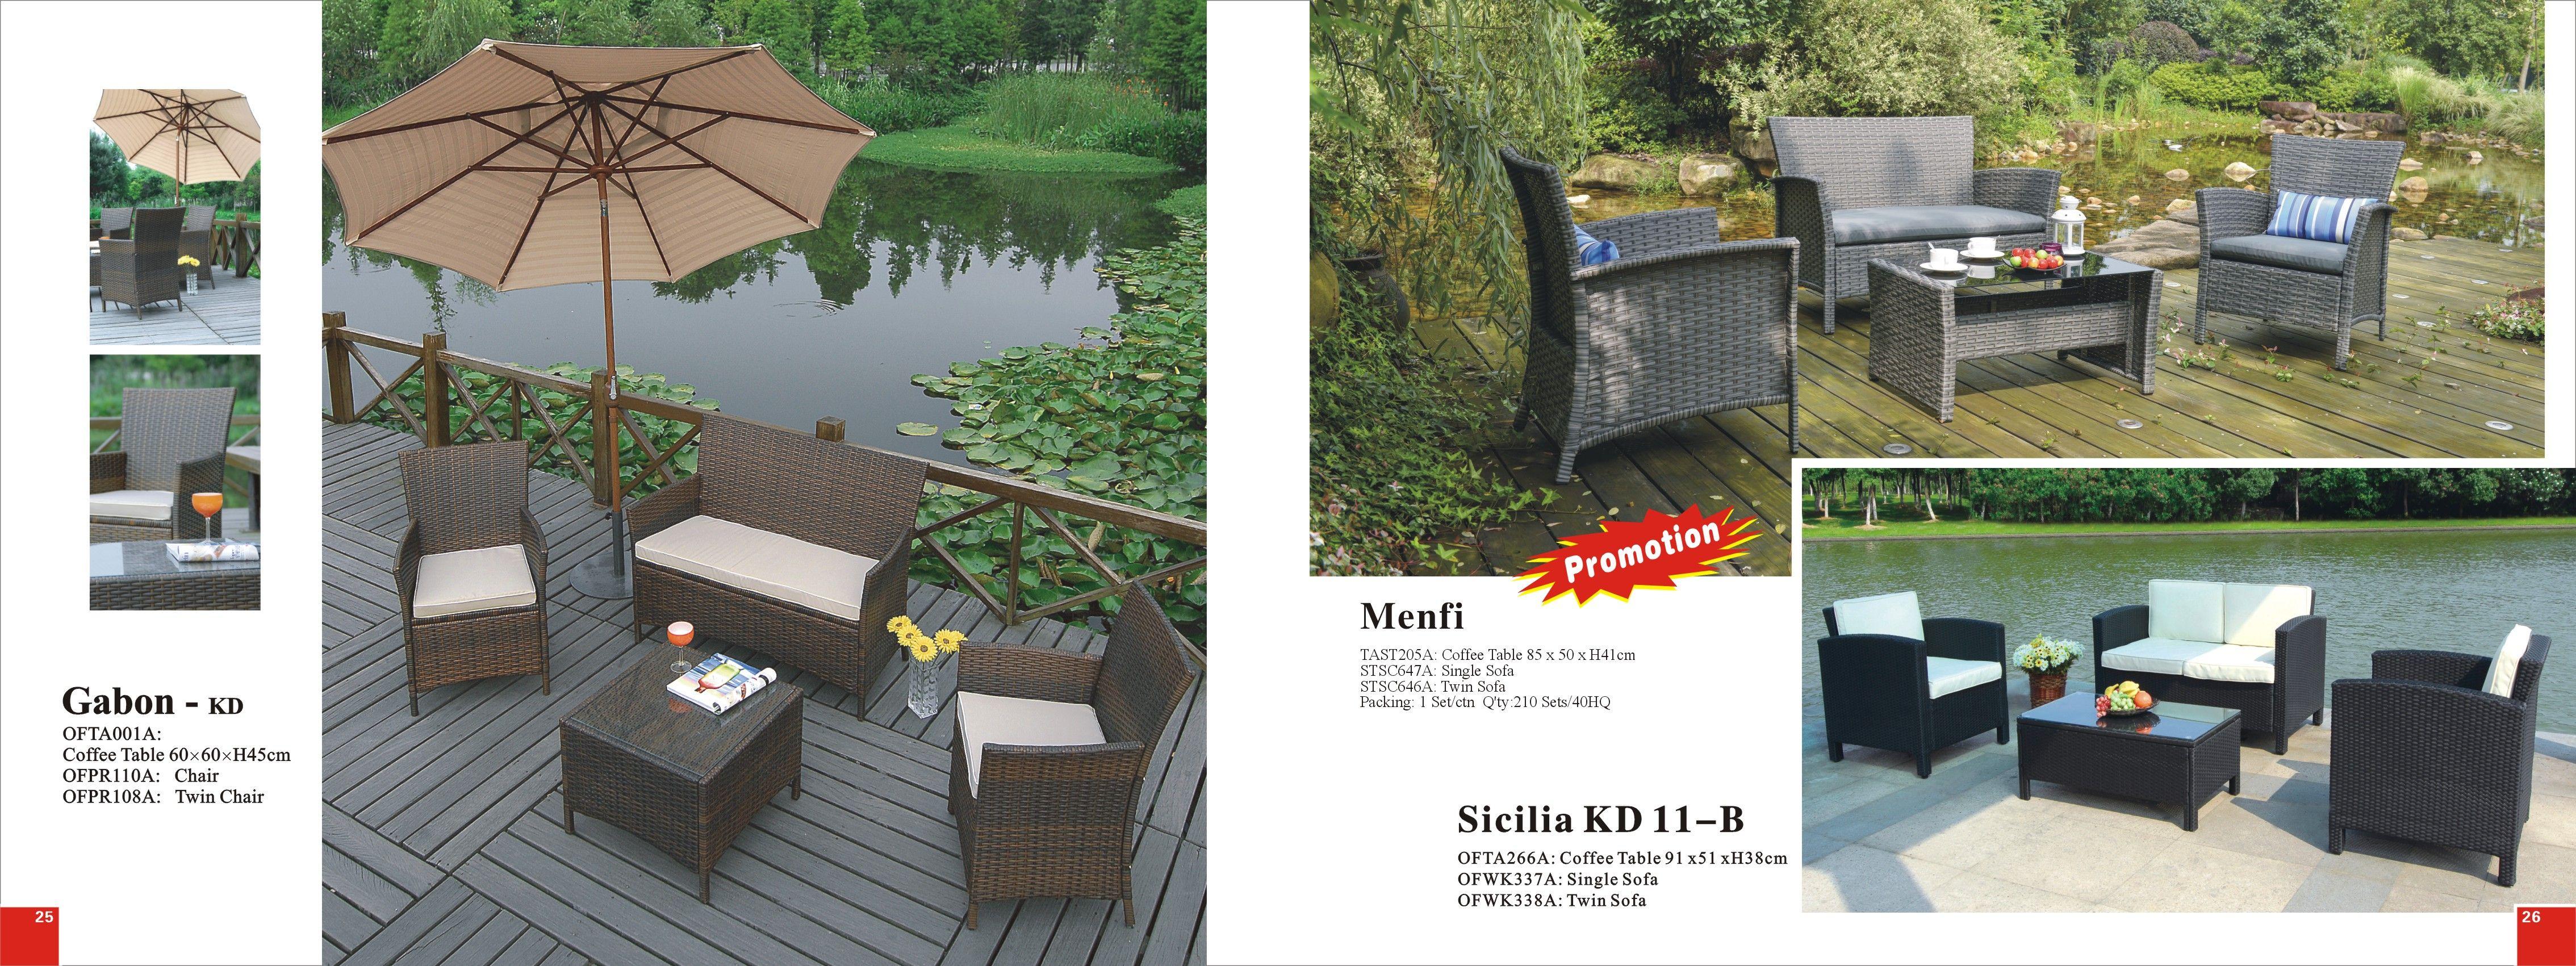 outdoor furniture | wicker outdoor dining sets | Pinterest